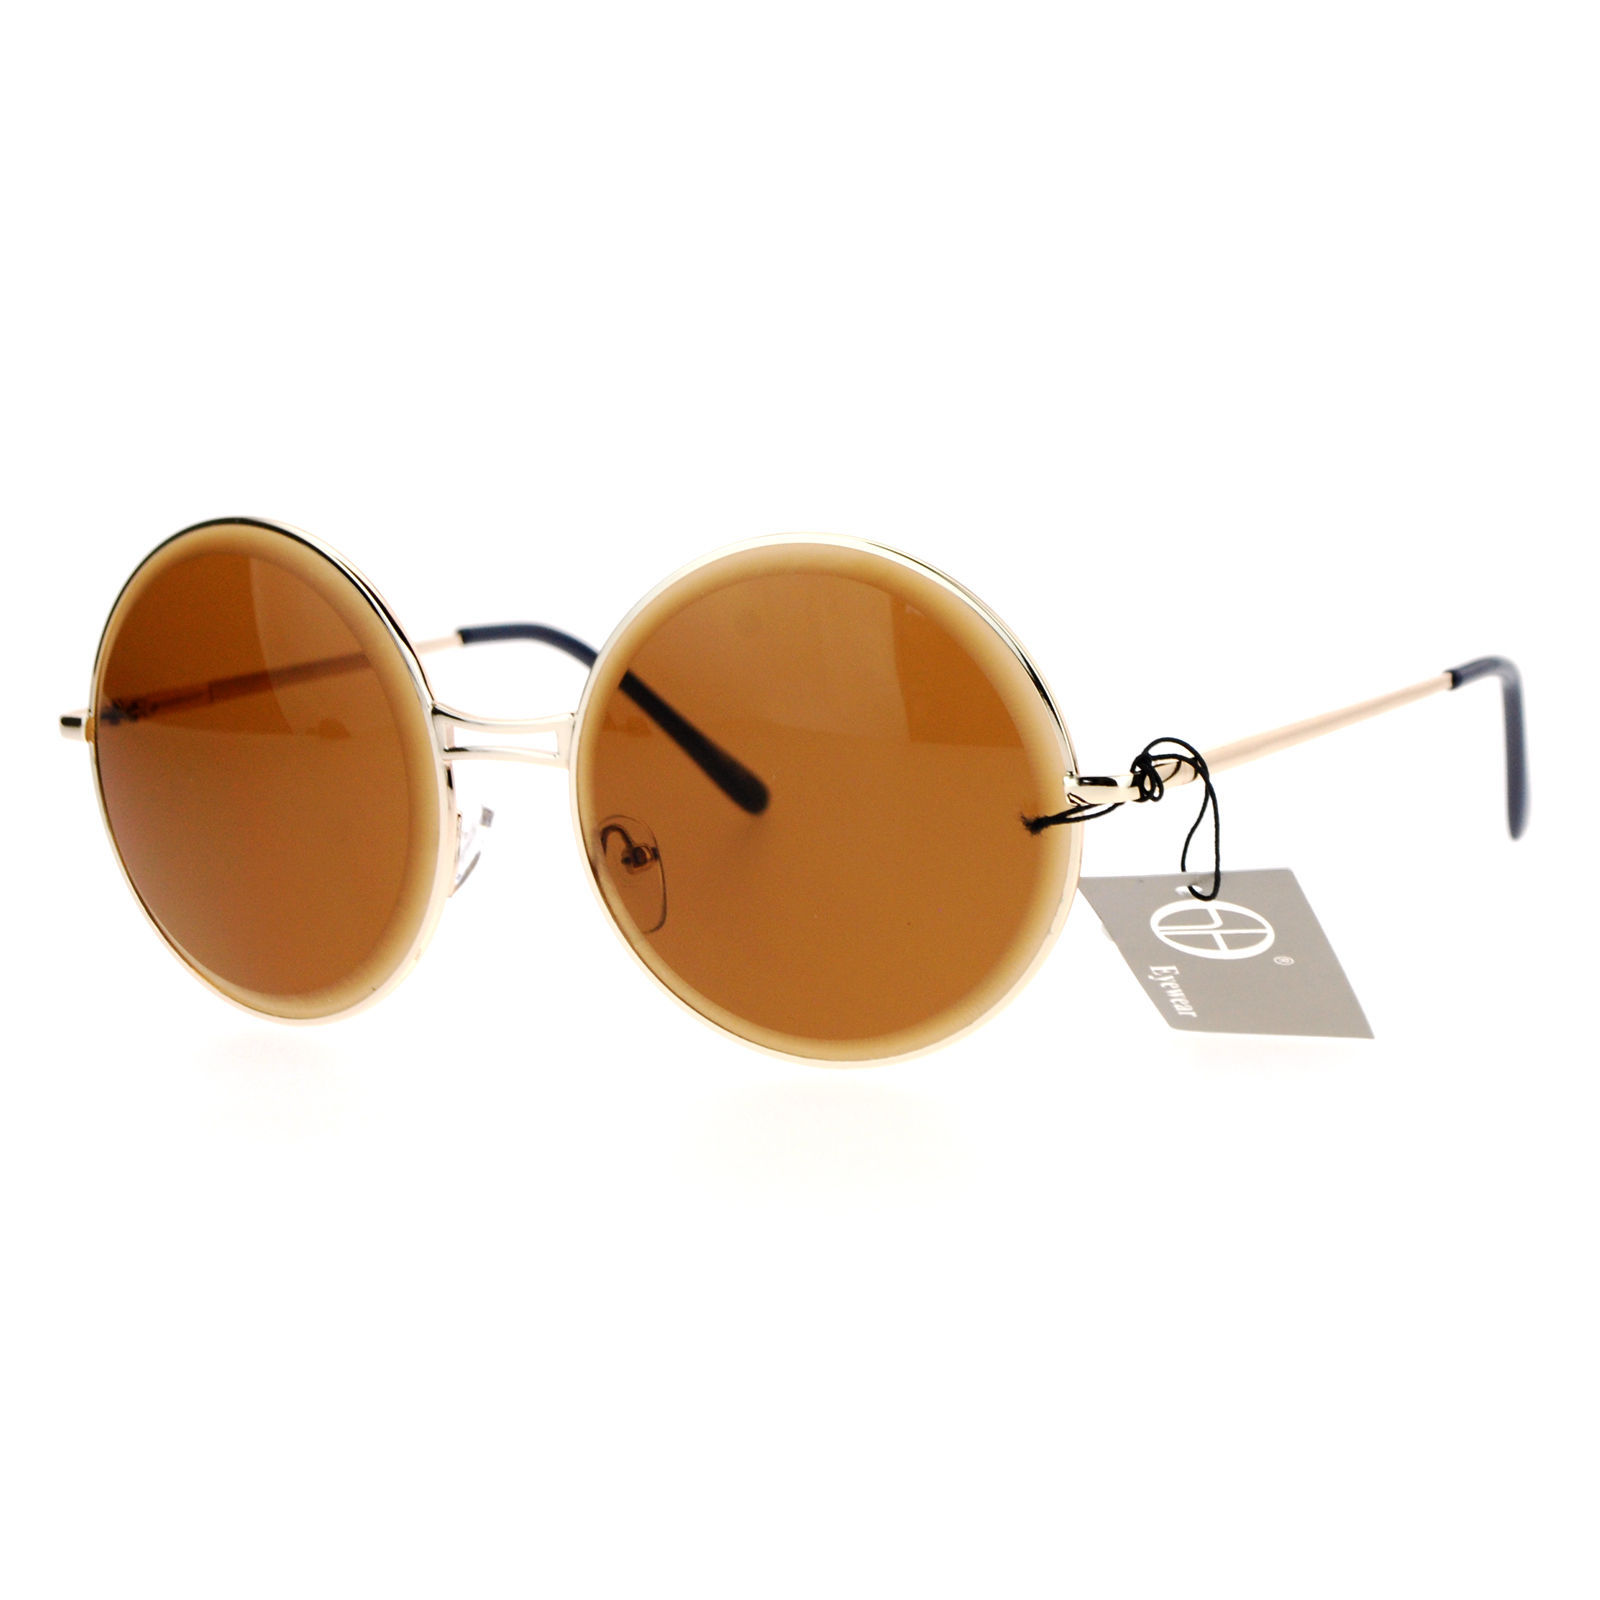 16c0126c99 Designer Fashion Sunglasses Womens Round Circle Frame Beveled Lens